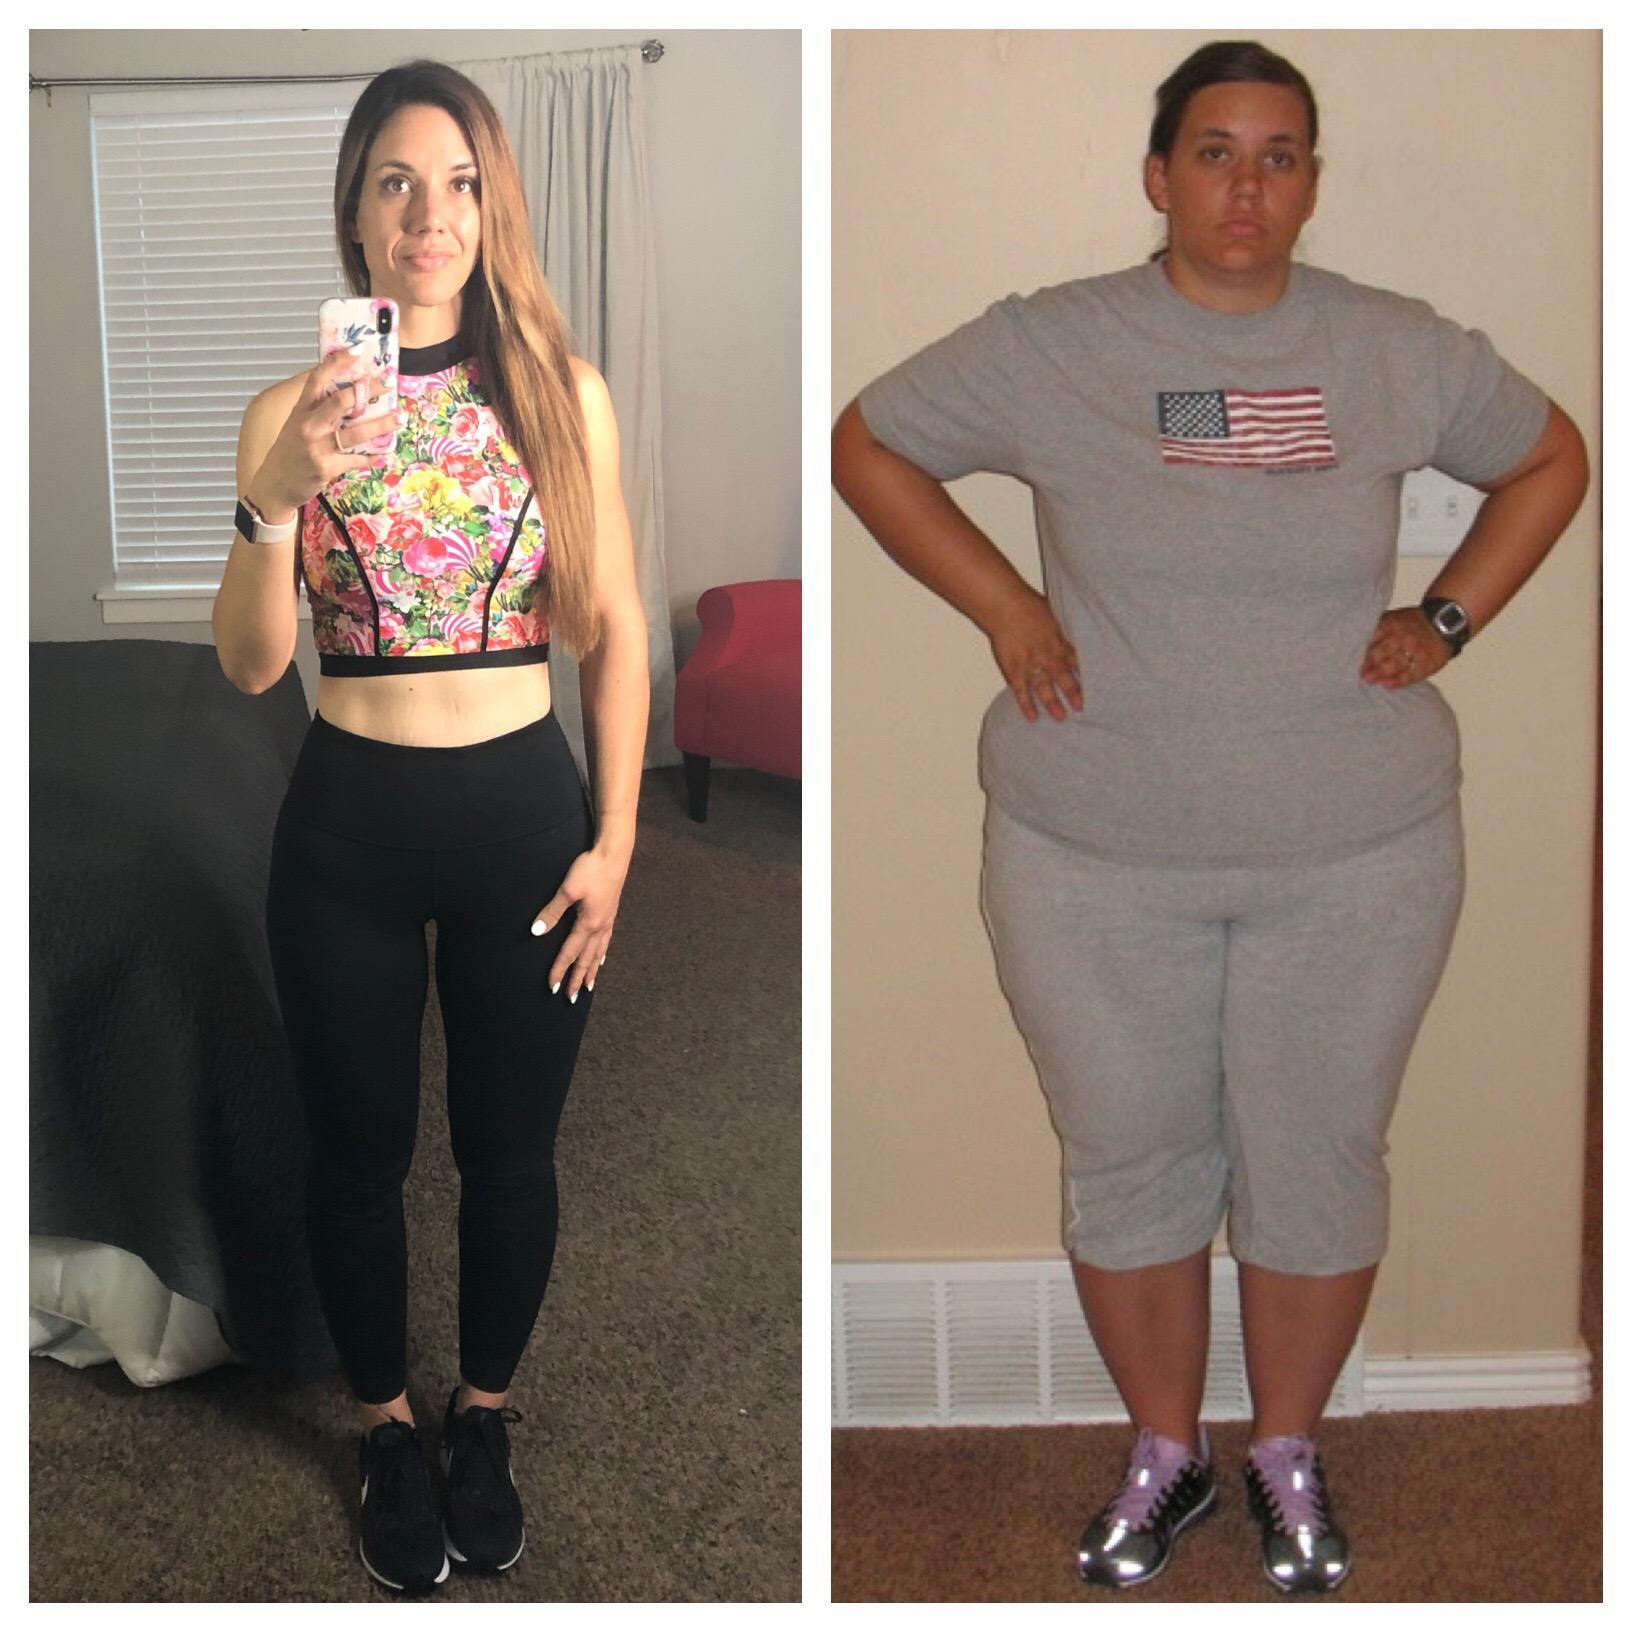 5 feet 7 Female 142 lbs Fat Loss 294 lbs to 152 lbs